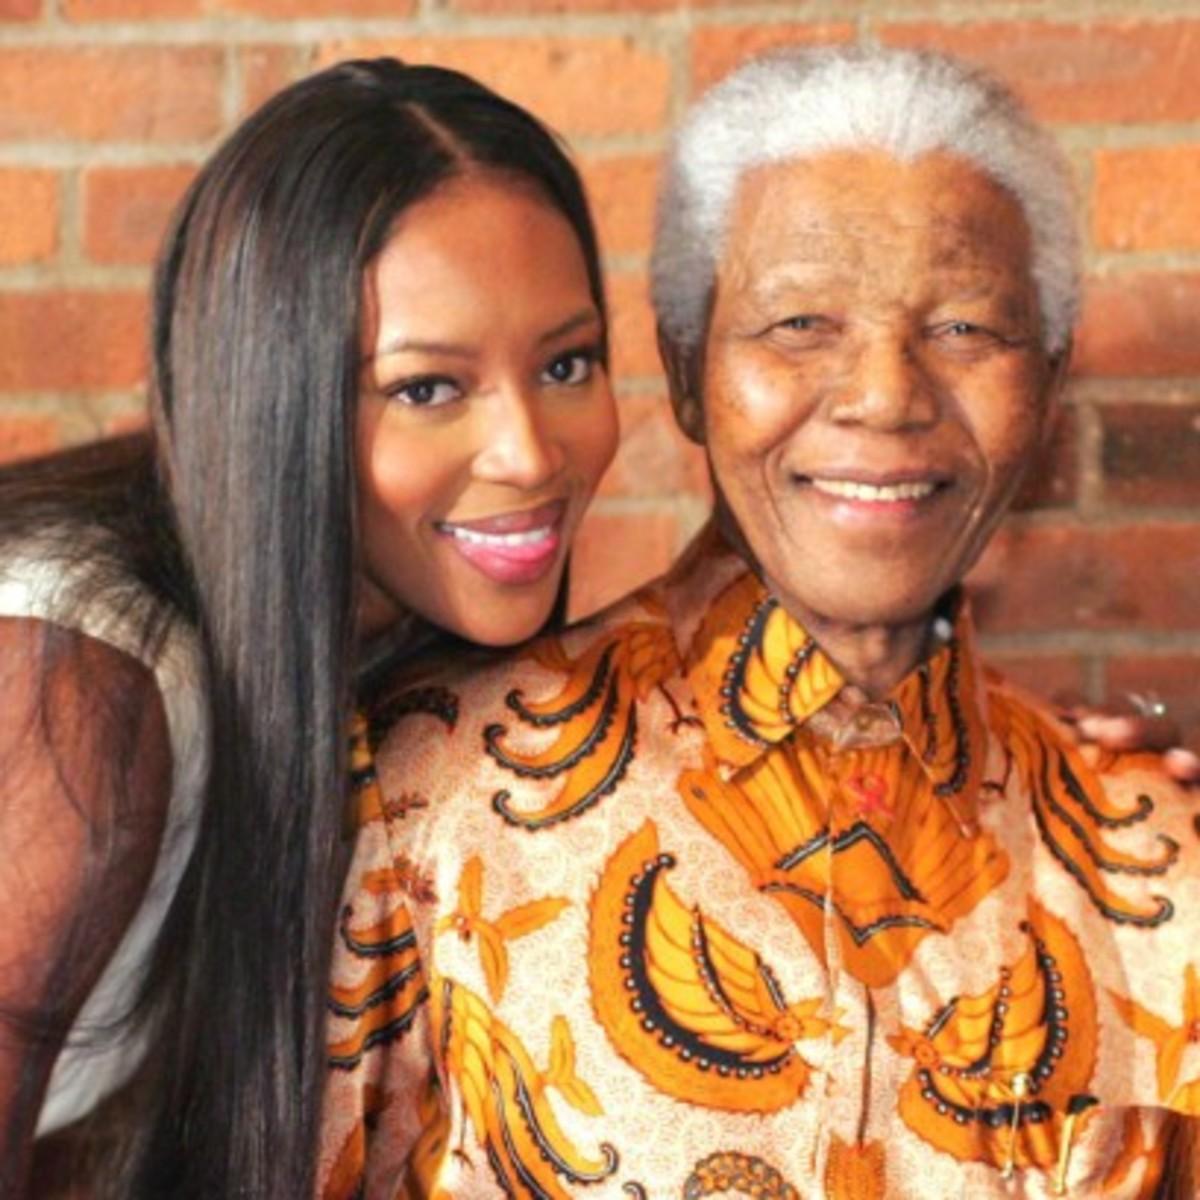 INTERNATIONAL MANDELA DAY: Remembering The Late Nelson Mandela